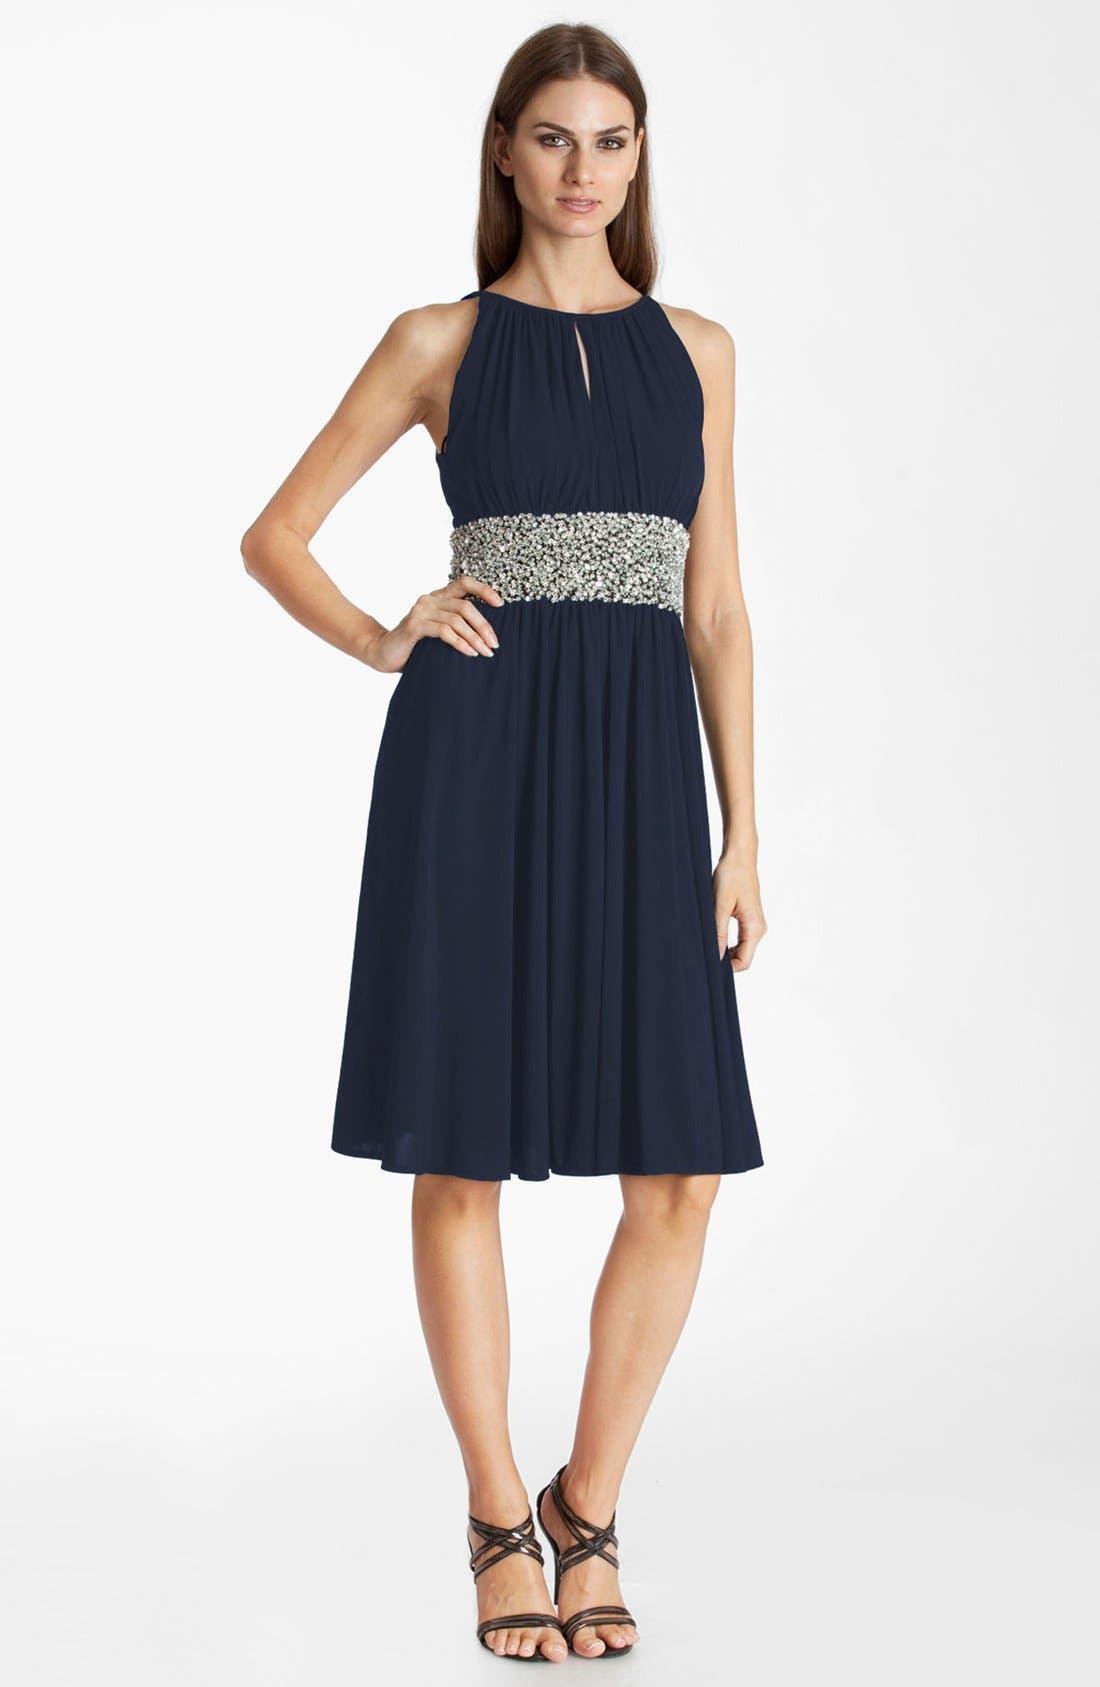 Alternate Image 1 Selected - JS Boutique Embellished Ruched Jersey Dress (Petite)